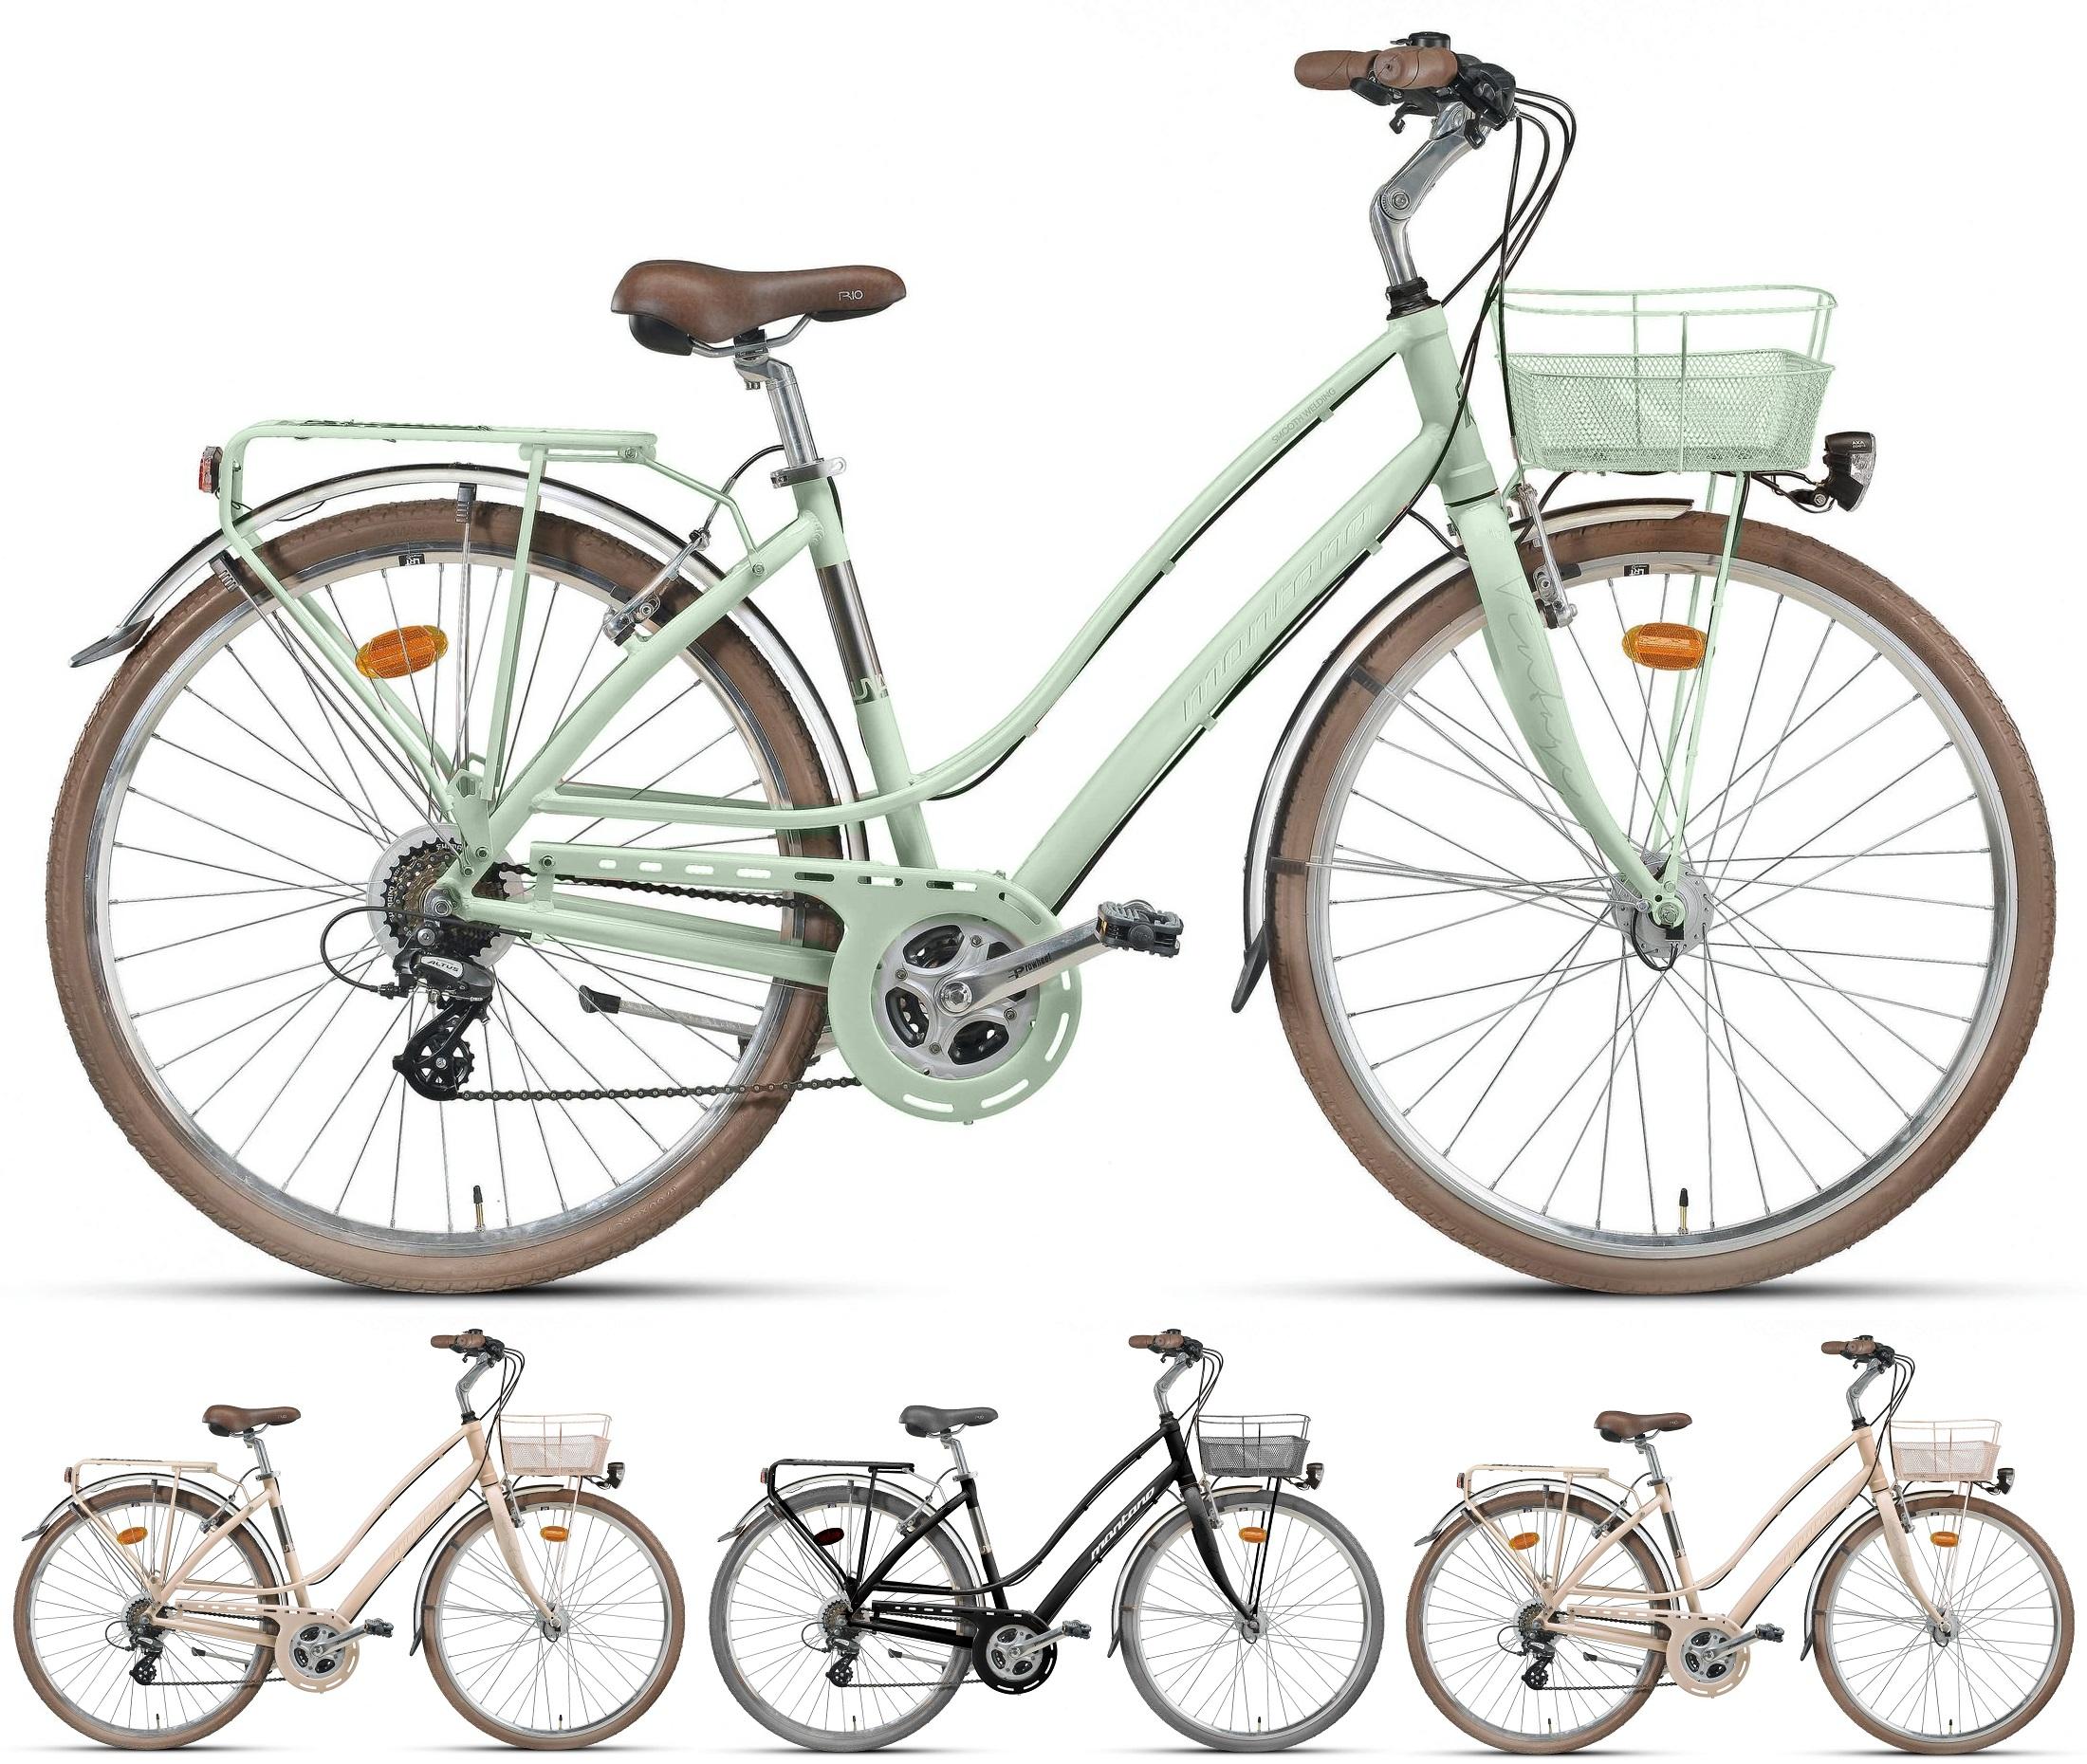 28 zoll damen city fahrrad montana lunapiena 21 gang alu. Black Bedroom Furniture Sets. Home Design Ideas